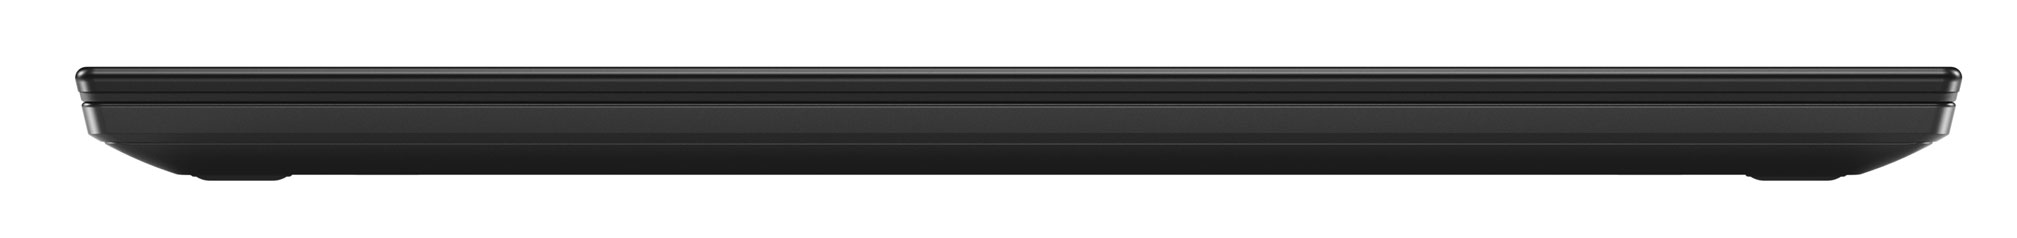 Фото  Ноутбук ThinkPad X280 (20KESDVW00)